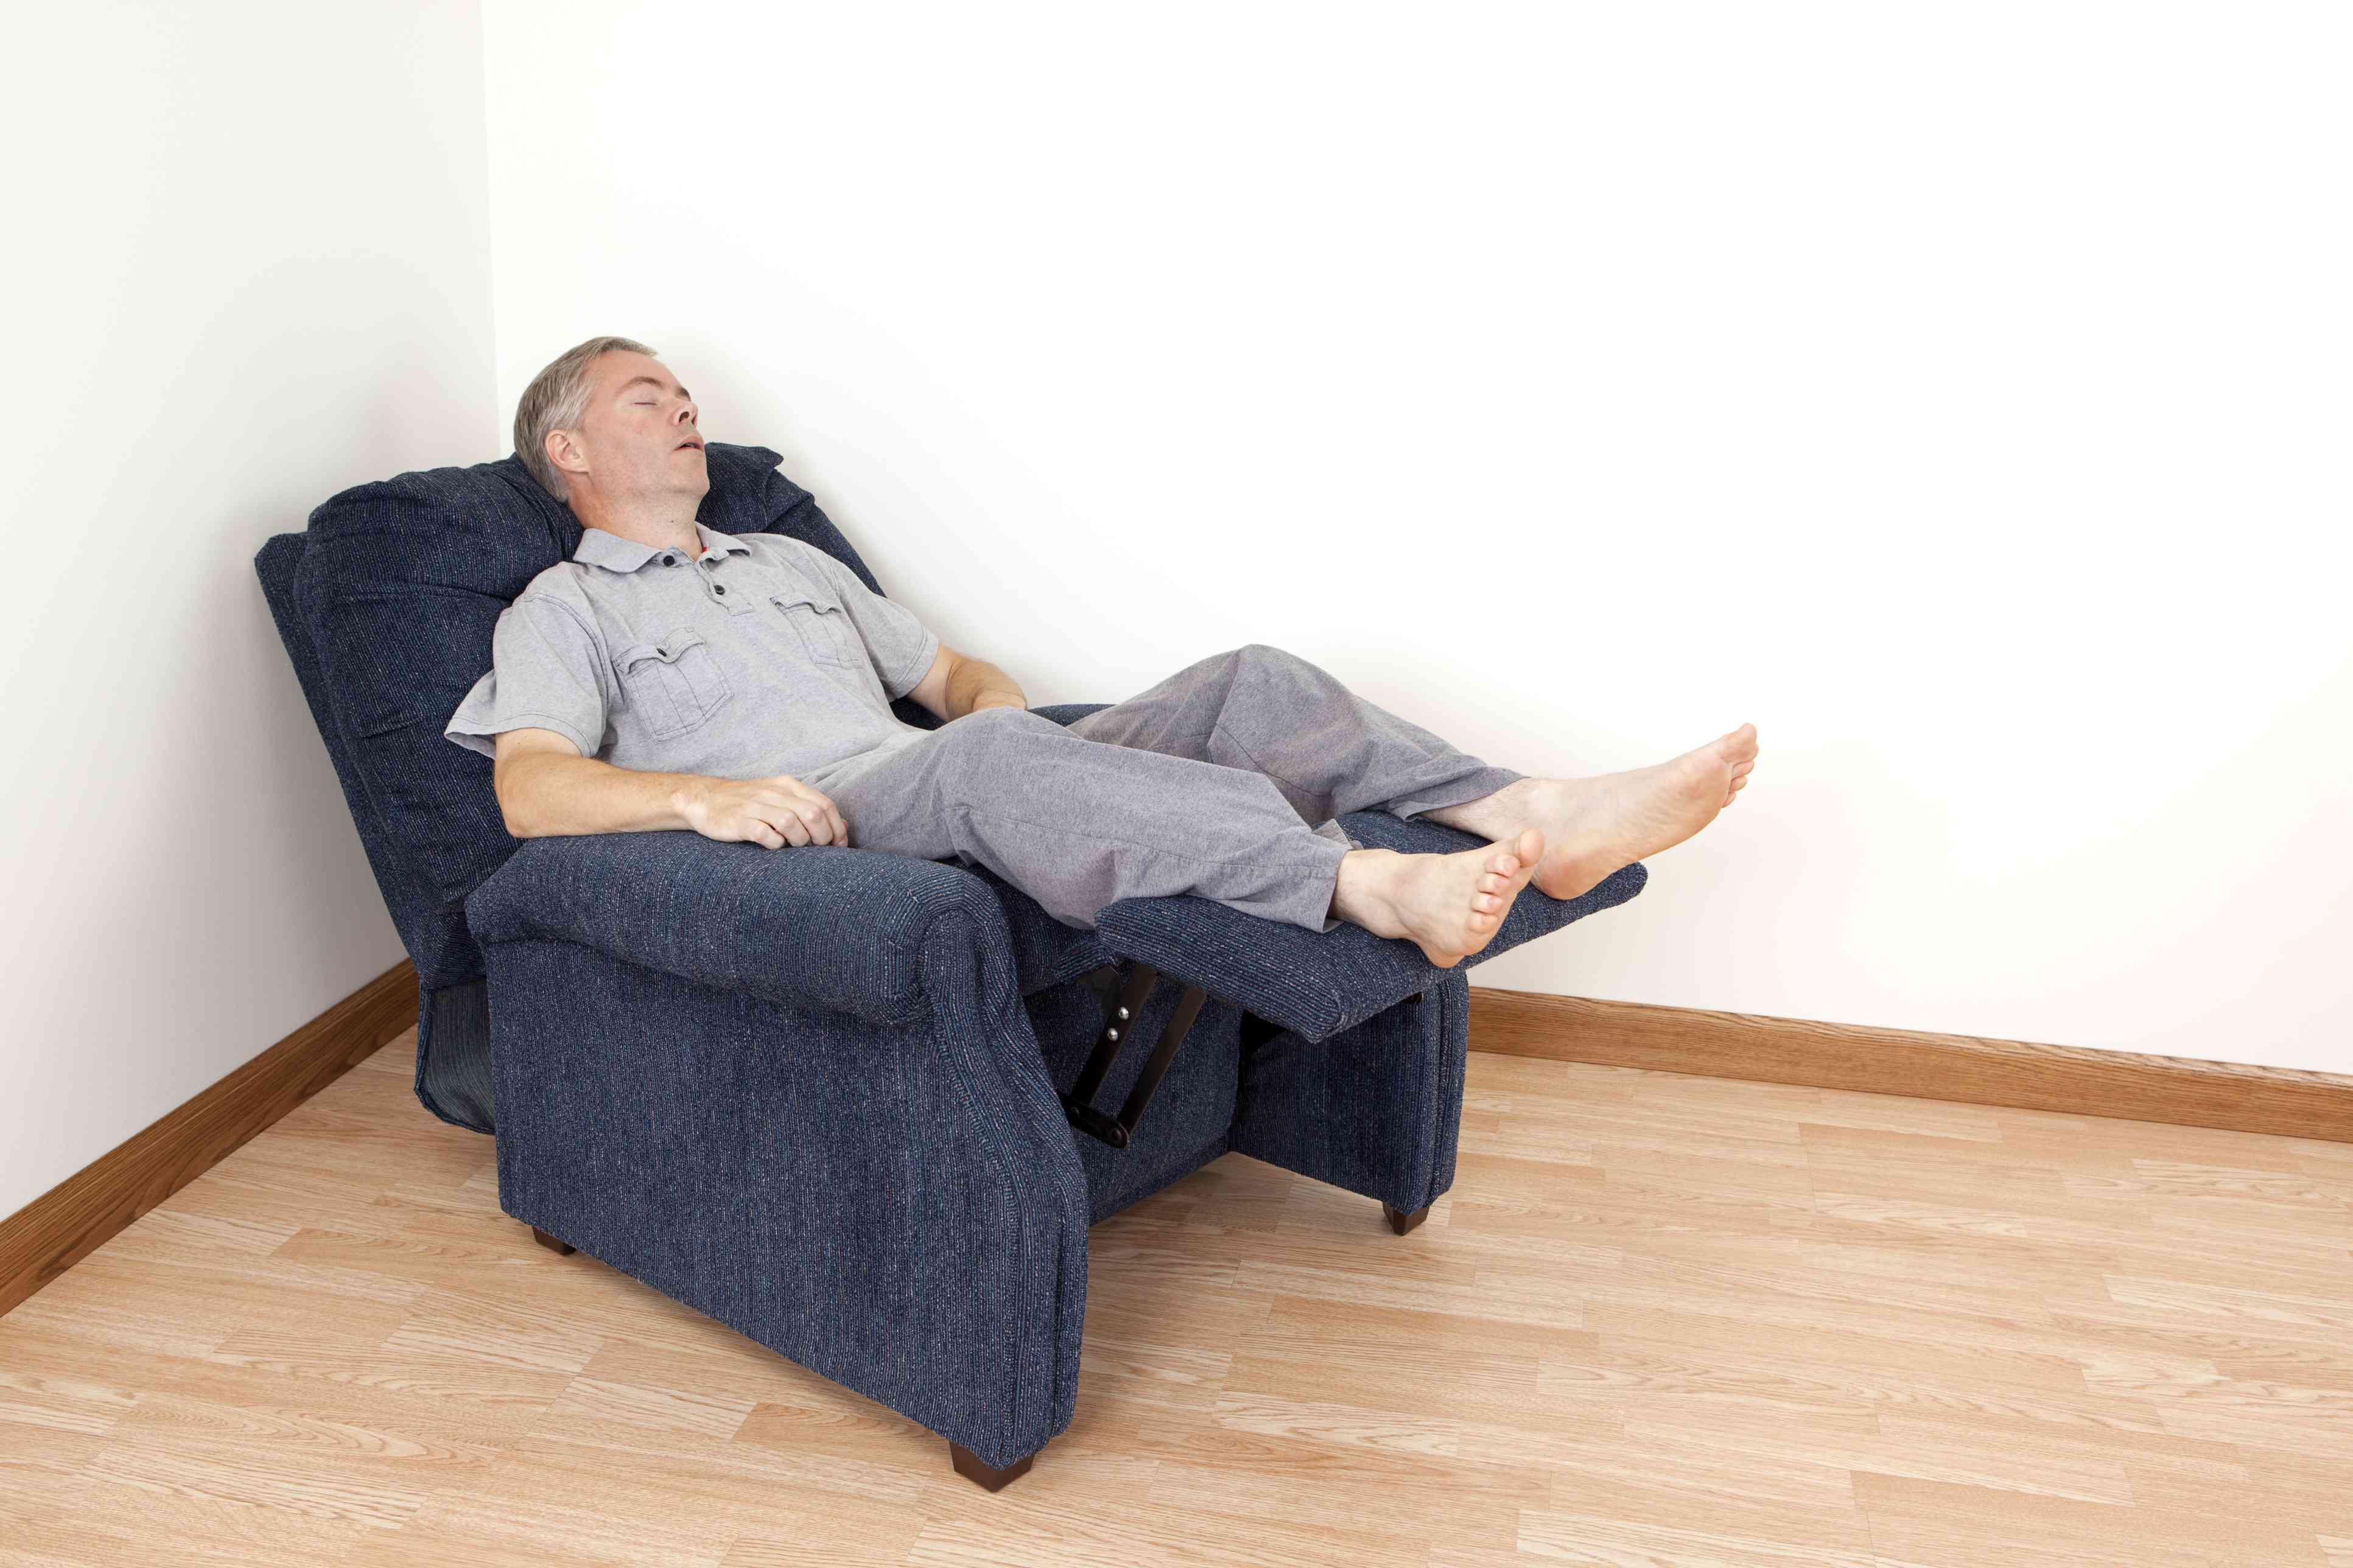 Man sleeping in a recliner chair